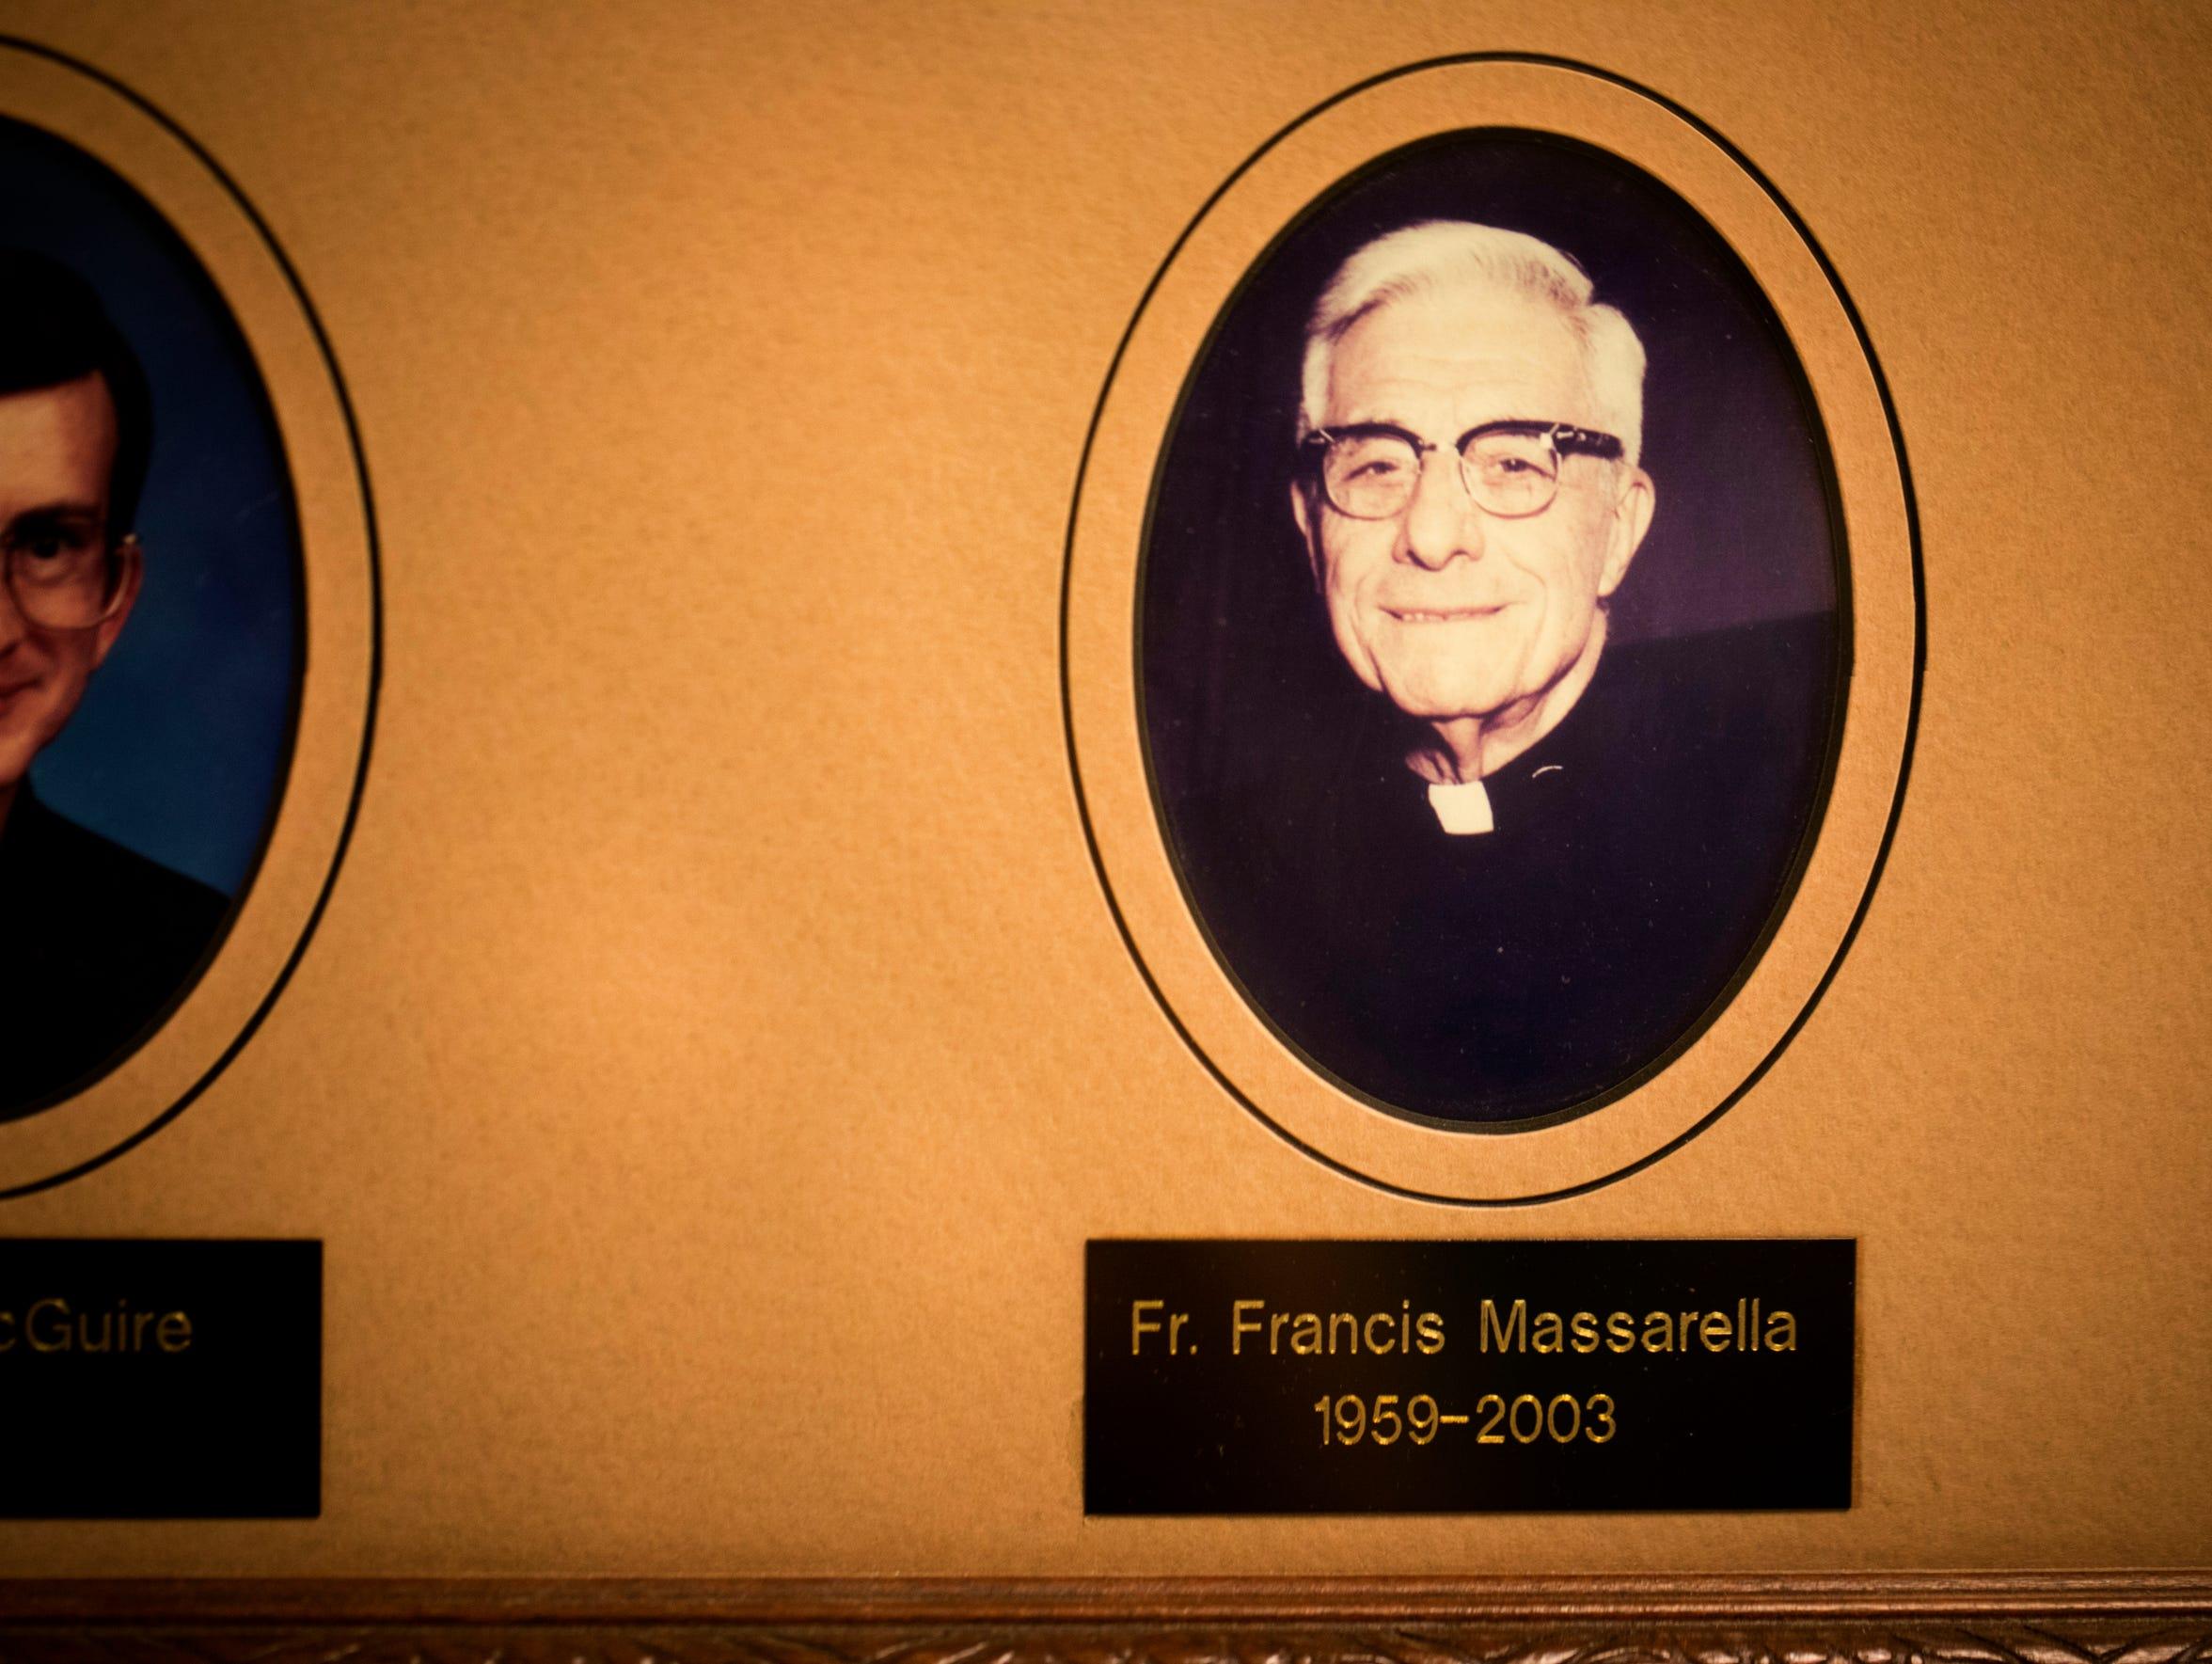 A photo of the Rev. Frank Massarella still hangs in